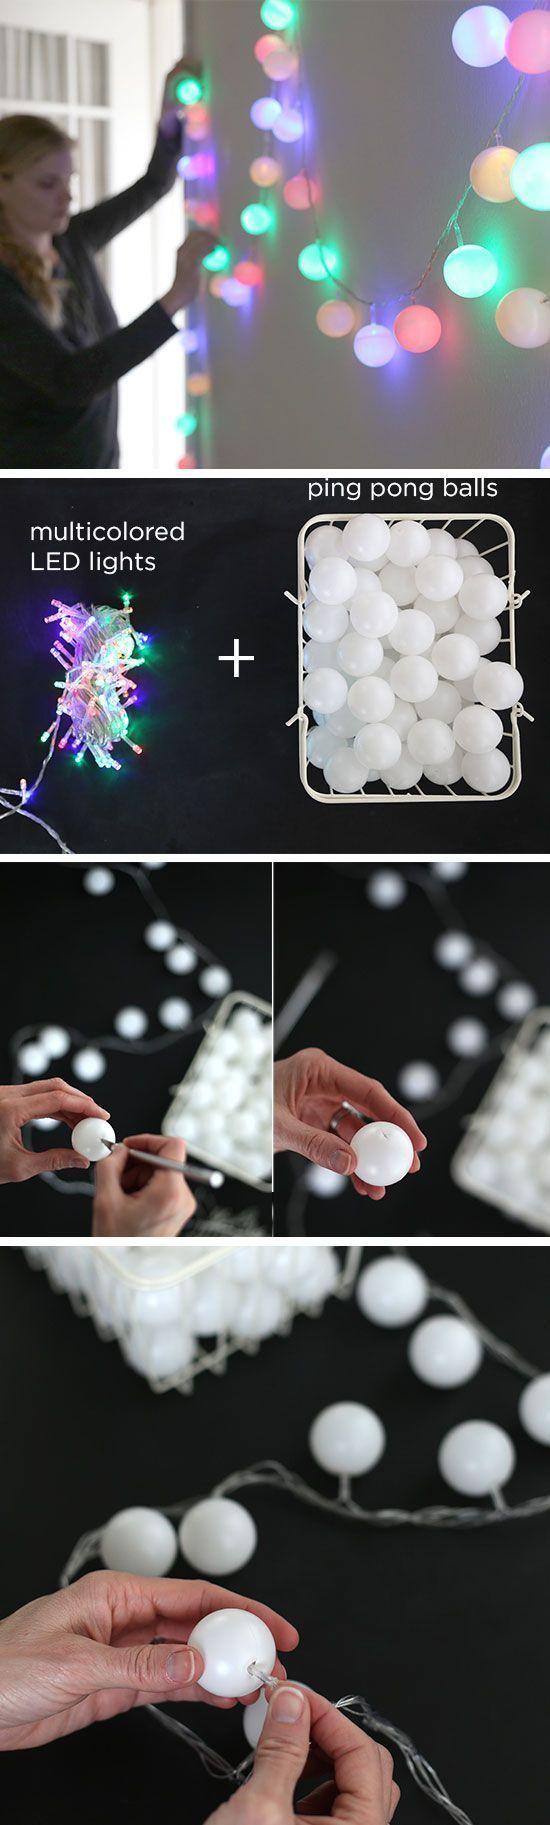 awesome 23 Amazing DIY Christmas Decor Ideas on a Budget